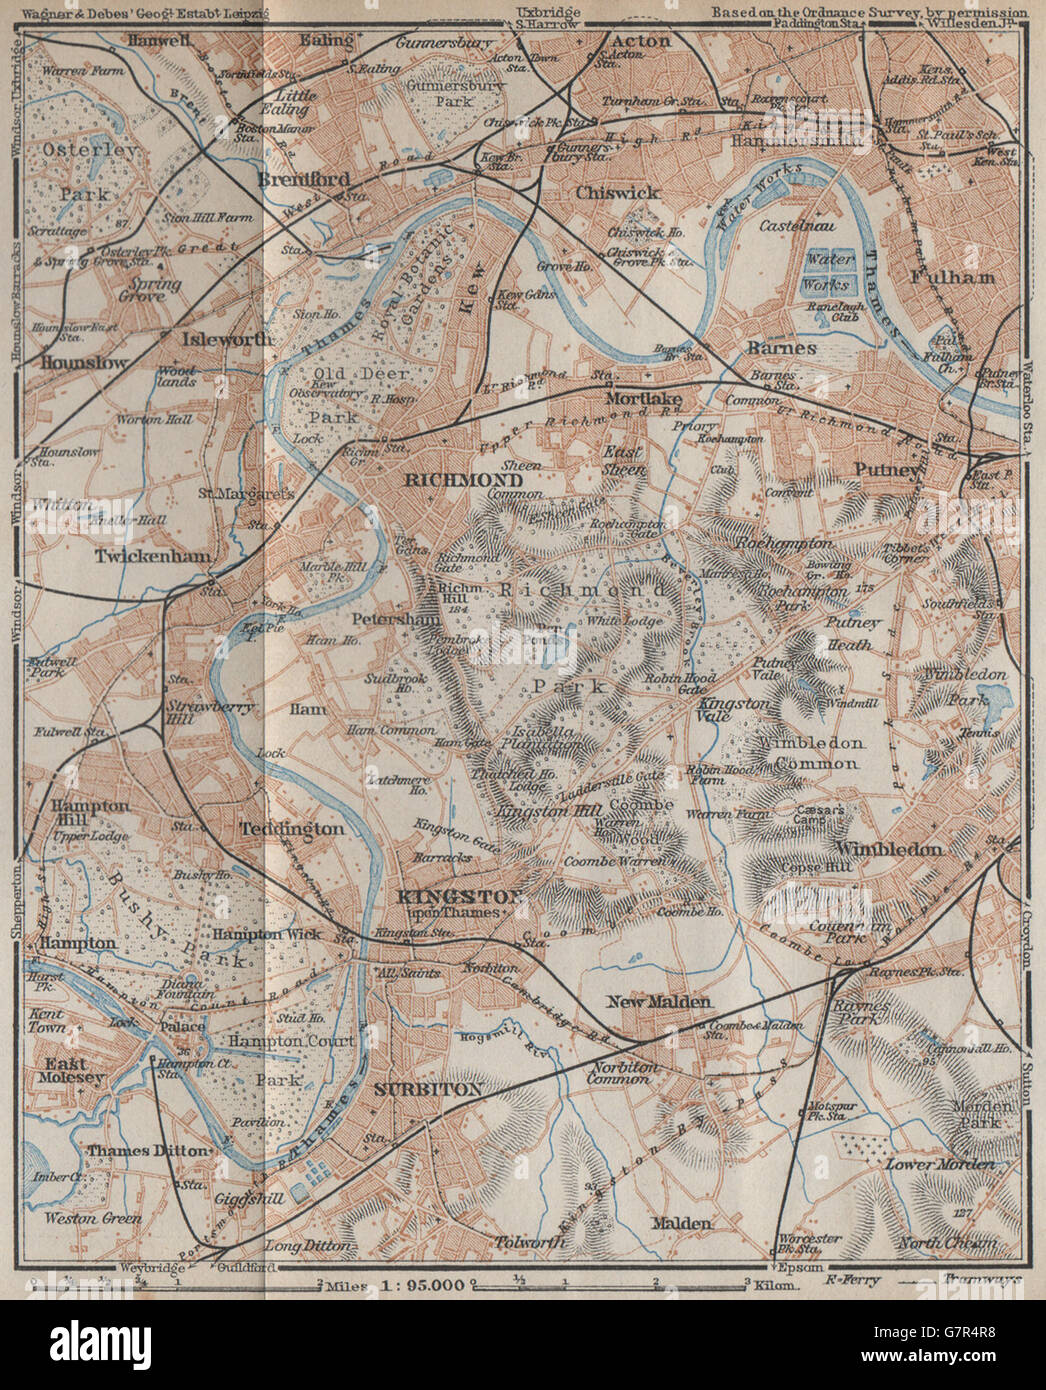 South West London Map.South West London Richmond Kingston Surbiton Putney Chiswick Stock